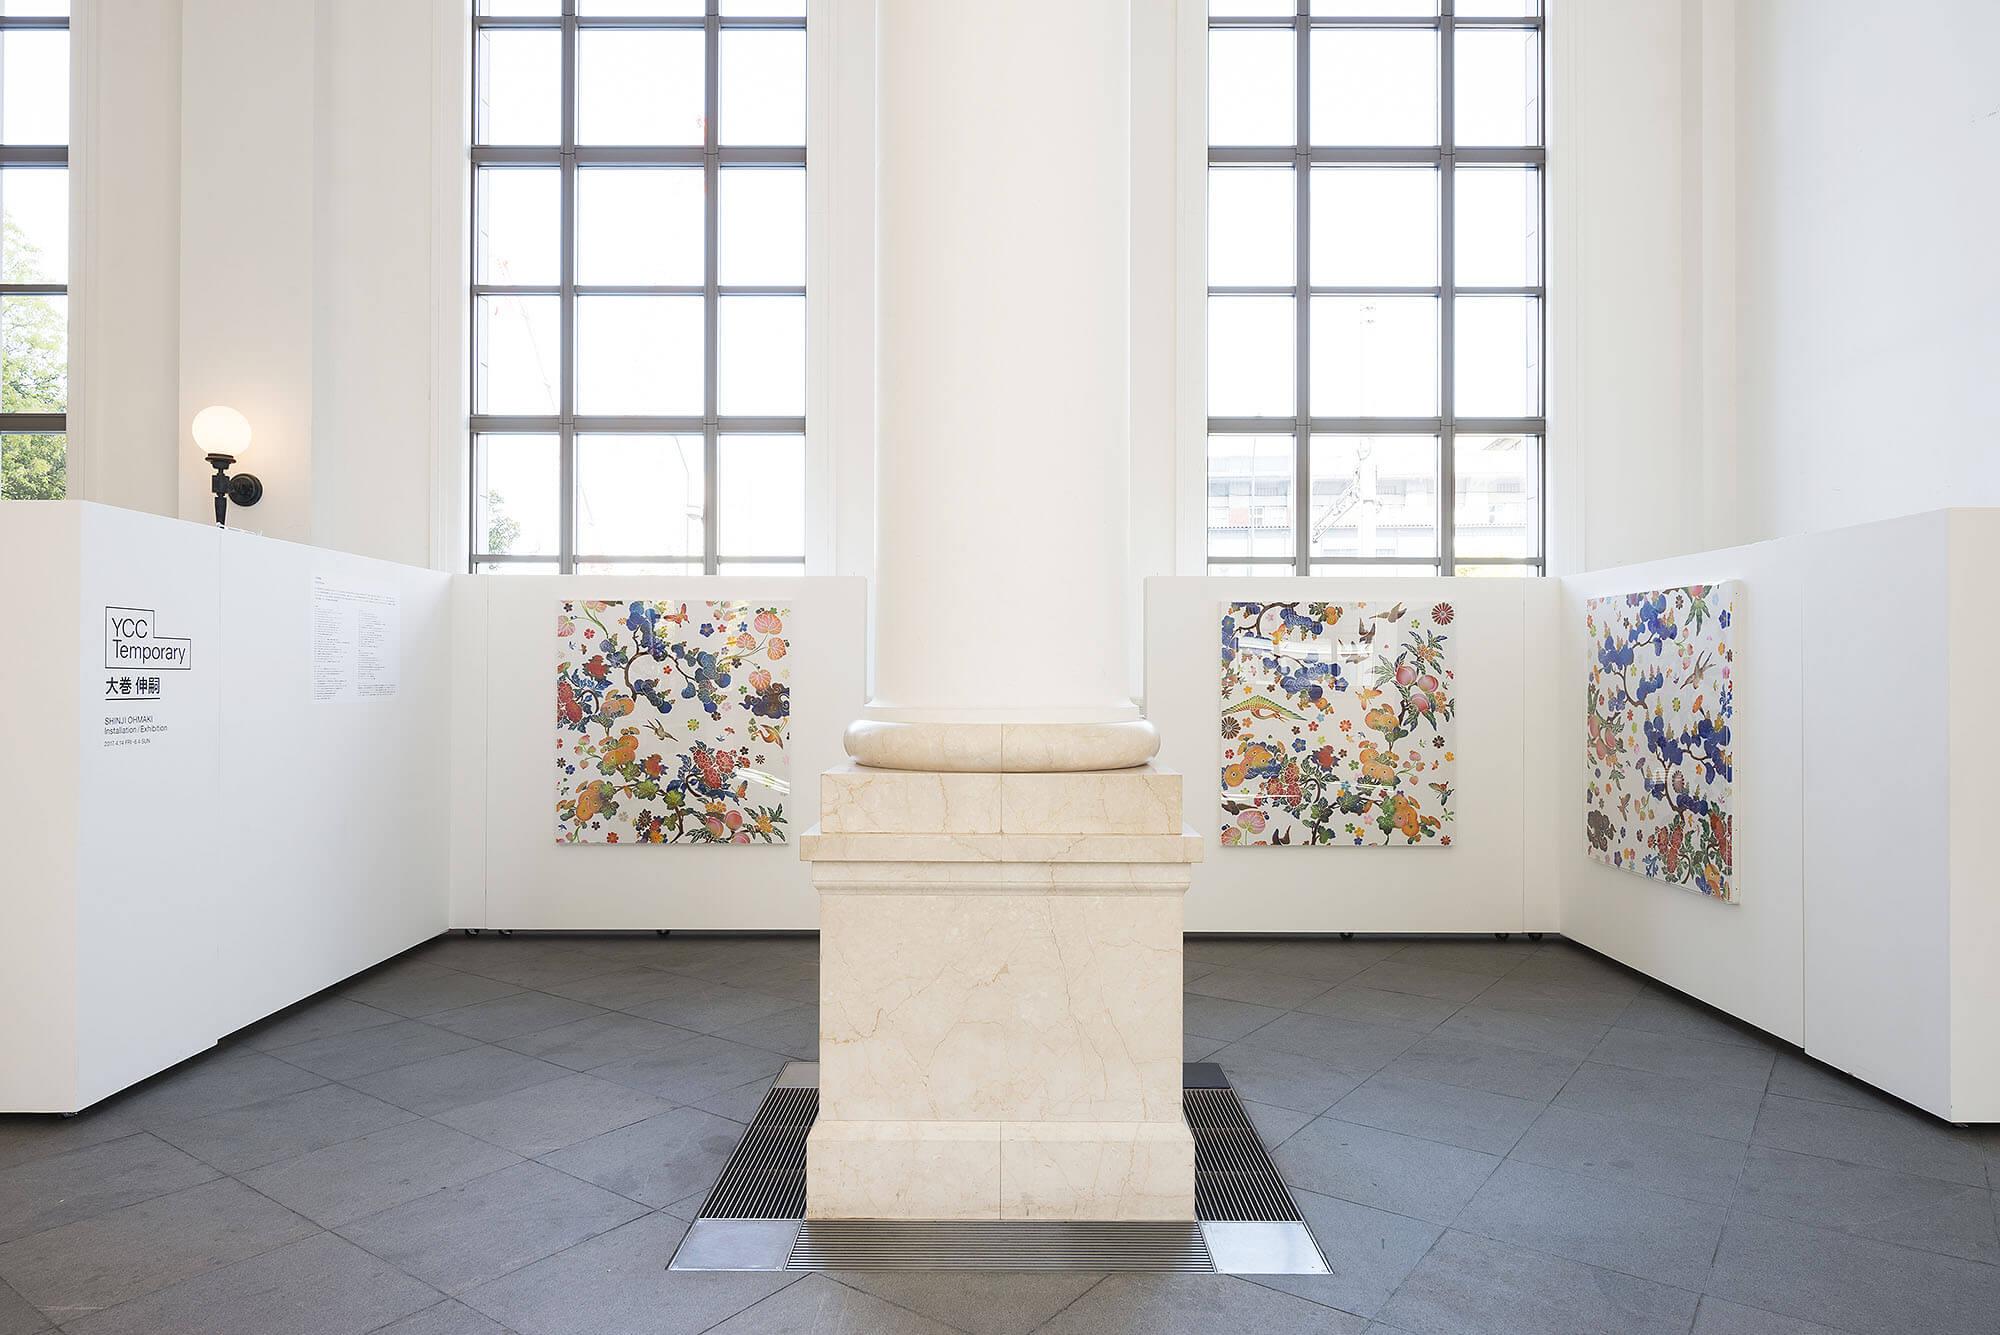 YCC Temporary 大巻伸嗣|offsociety inc. YCC Temporary Shinji Ohmaki 現代美術・アート Contemporary Art